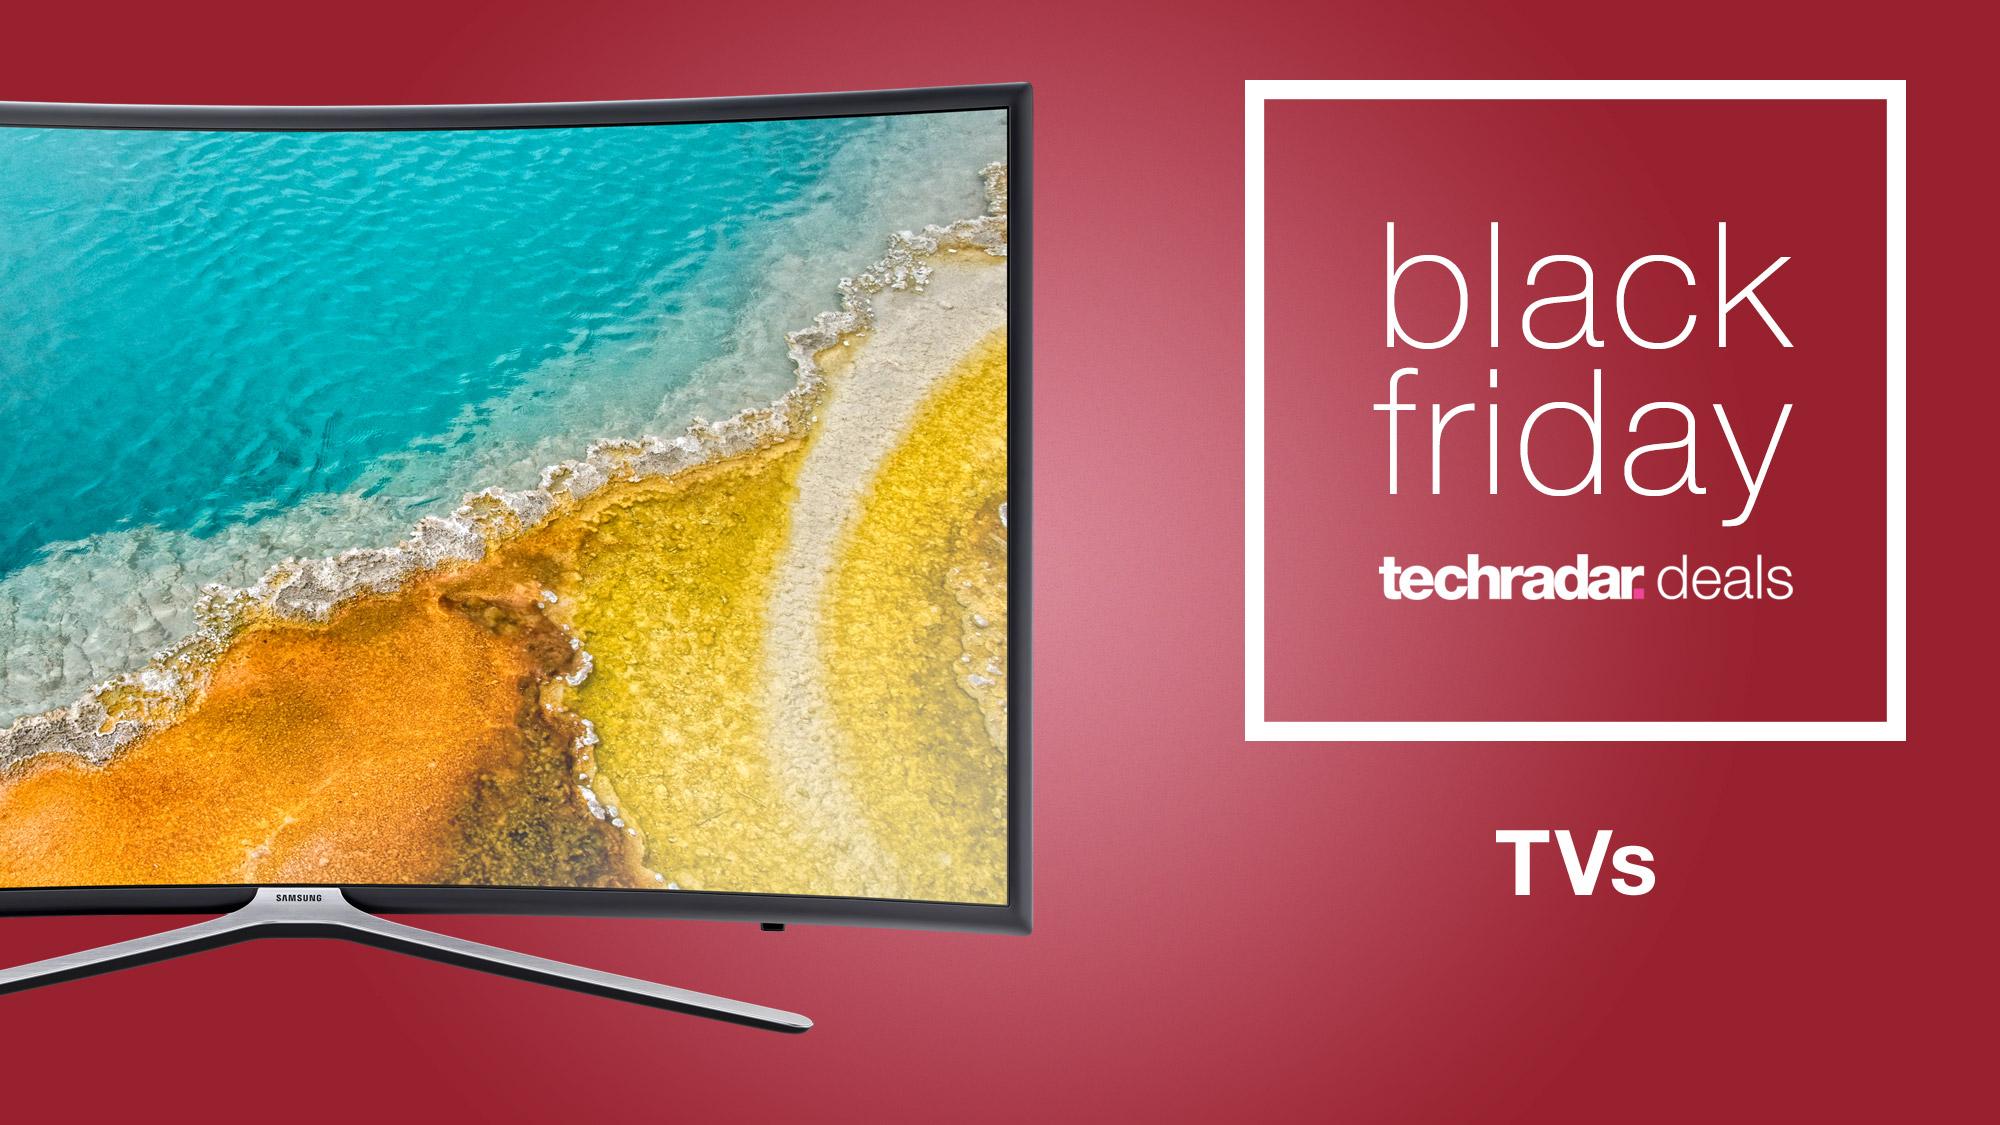 Best Black Friday Tv Deals 2020 4k Tv Deals On Samsung Lg Tcl And More Techradar